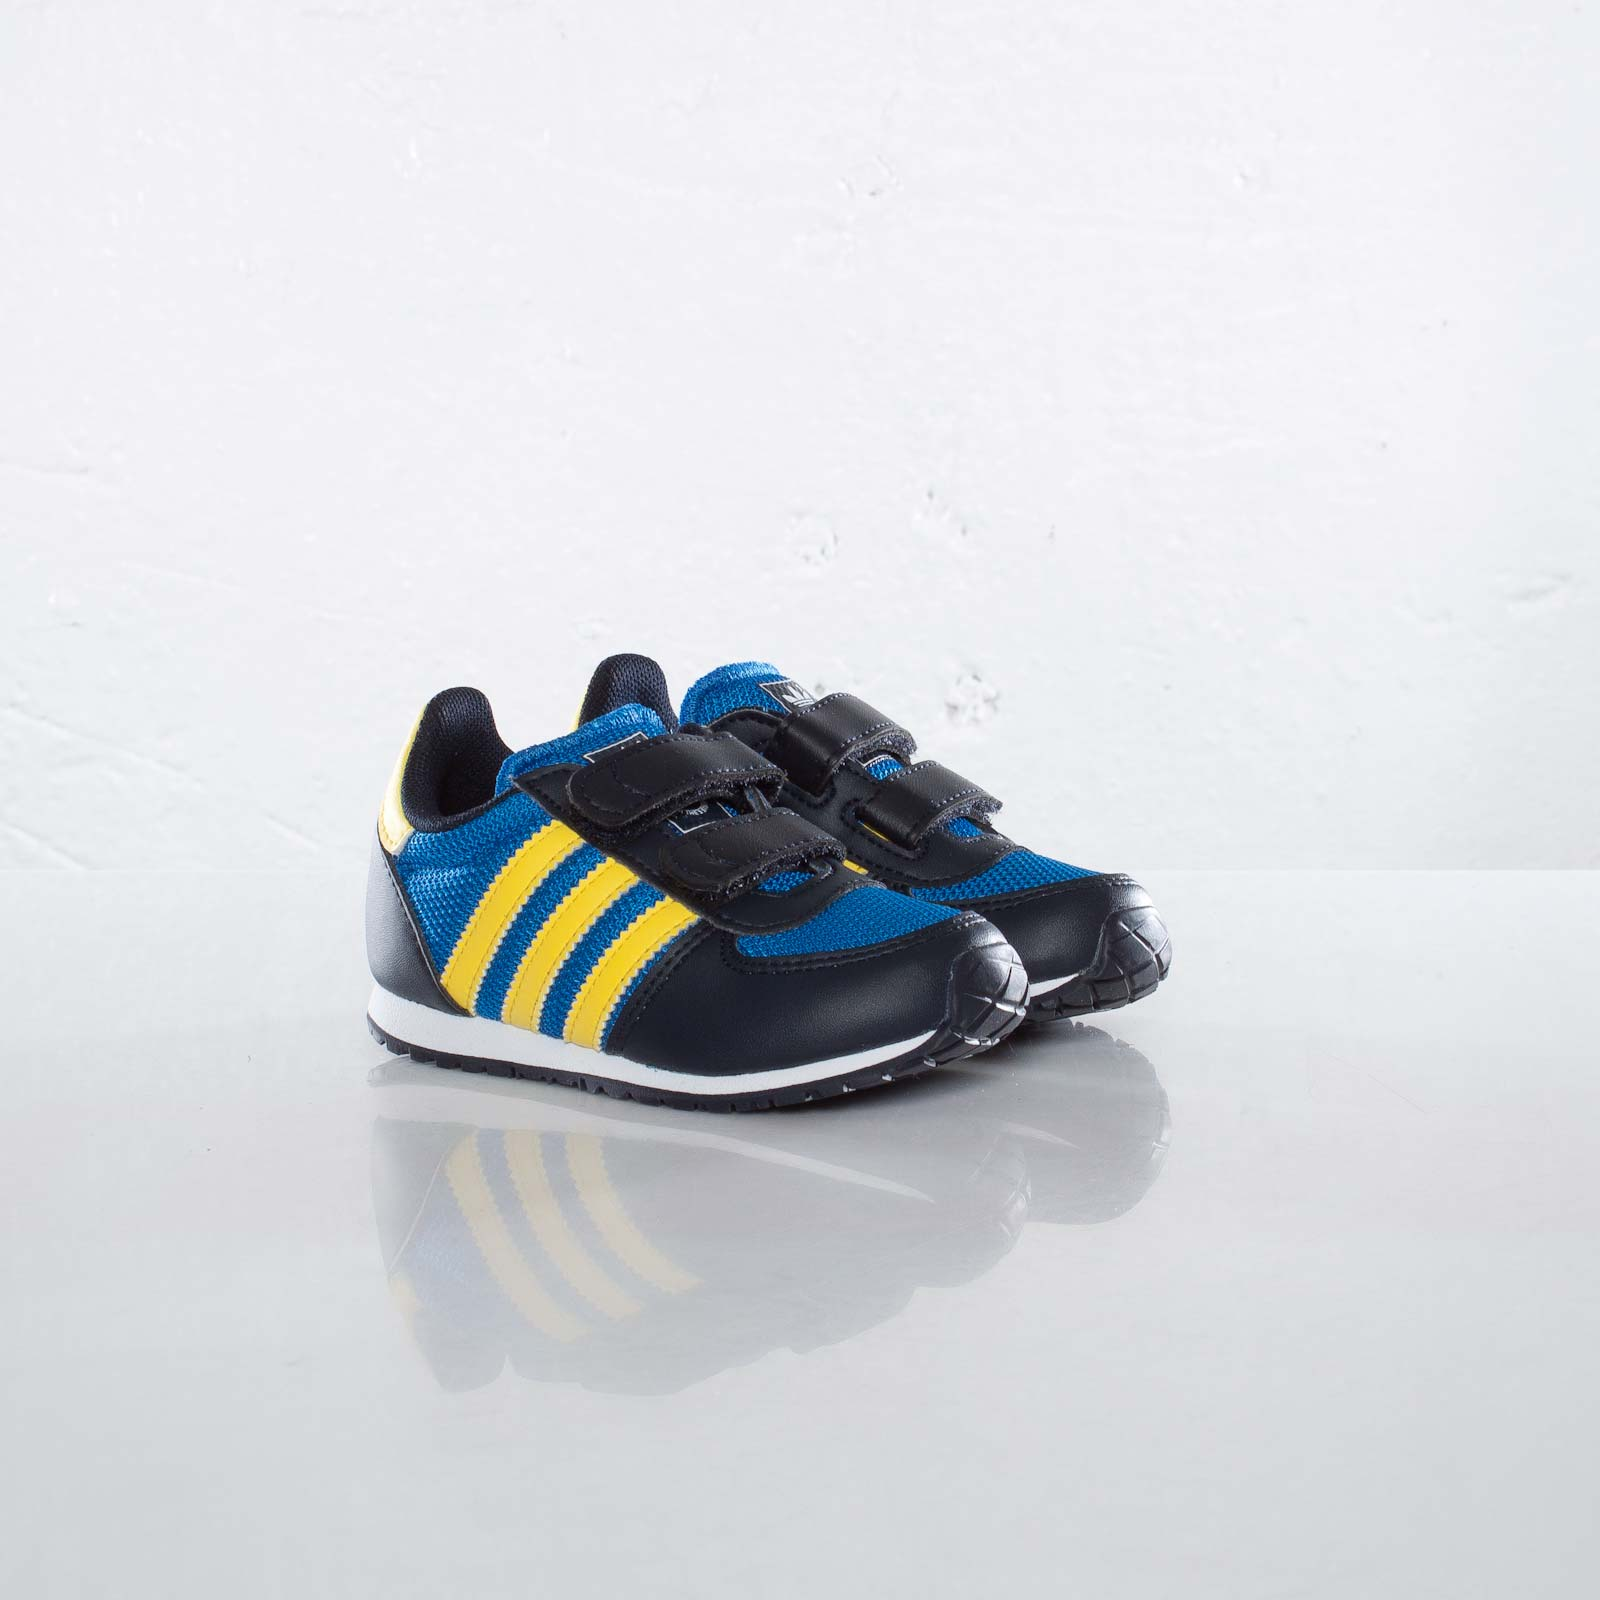 ed269cb48d22f9 adidas Adistar Racer CF I - Q22843 - Sneakersnstuff